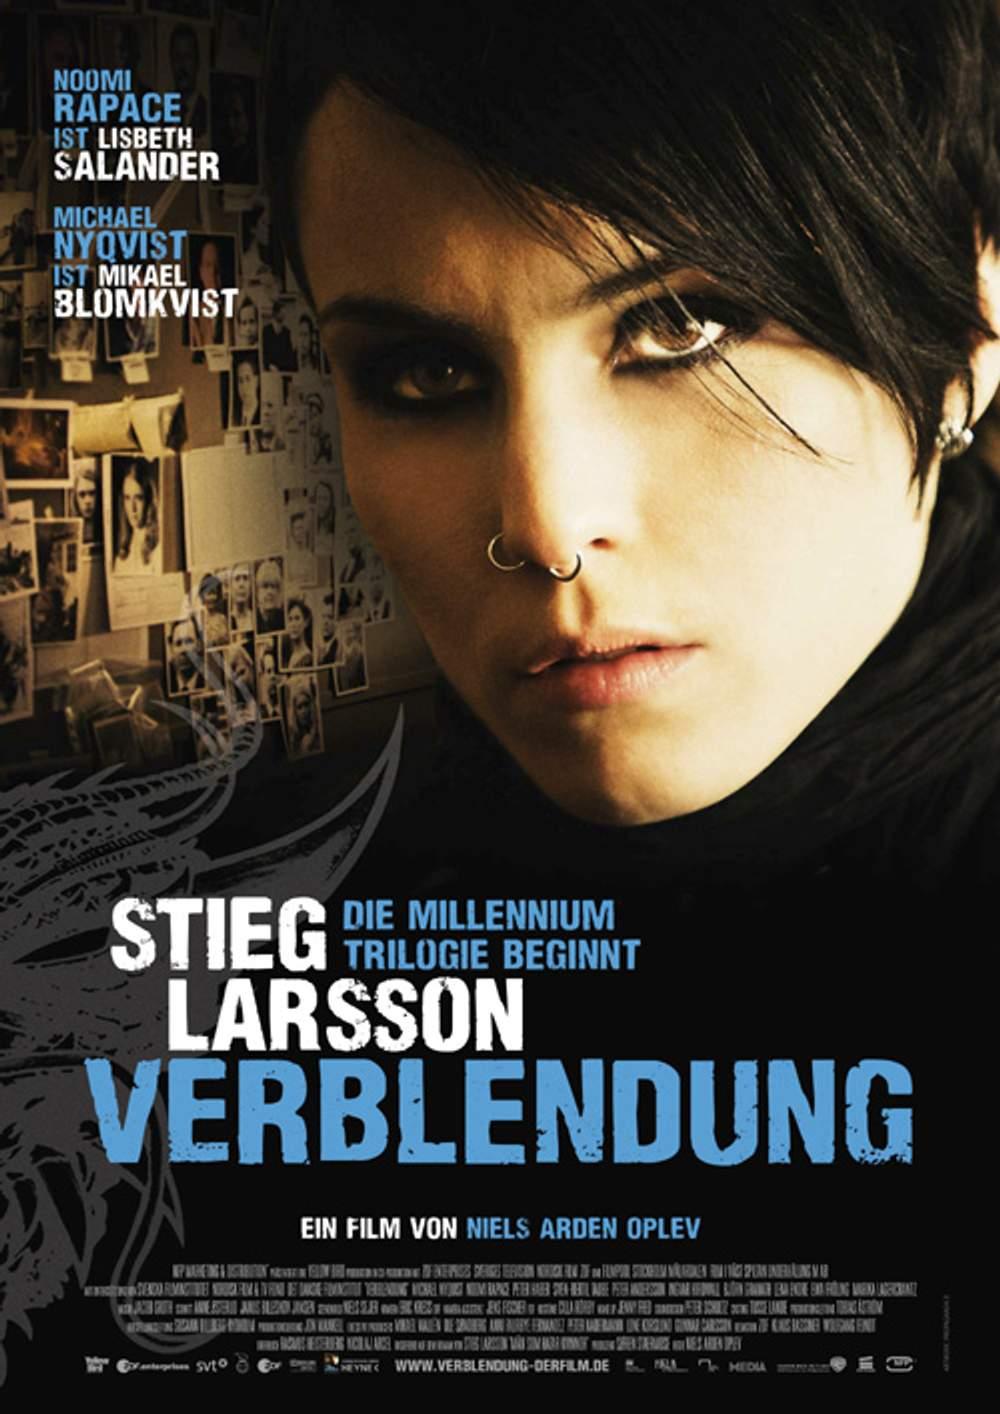 Filmkritik filmnazis millenium stig larson